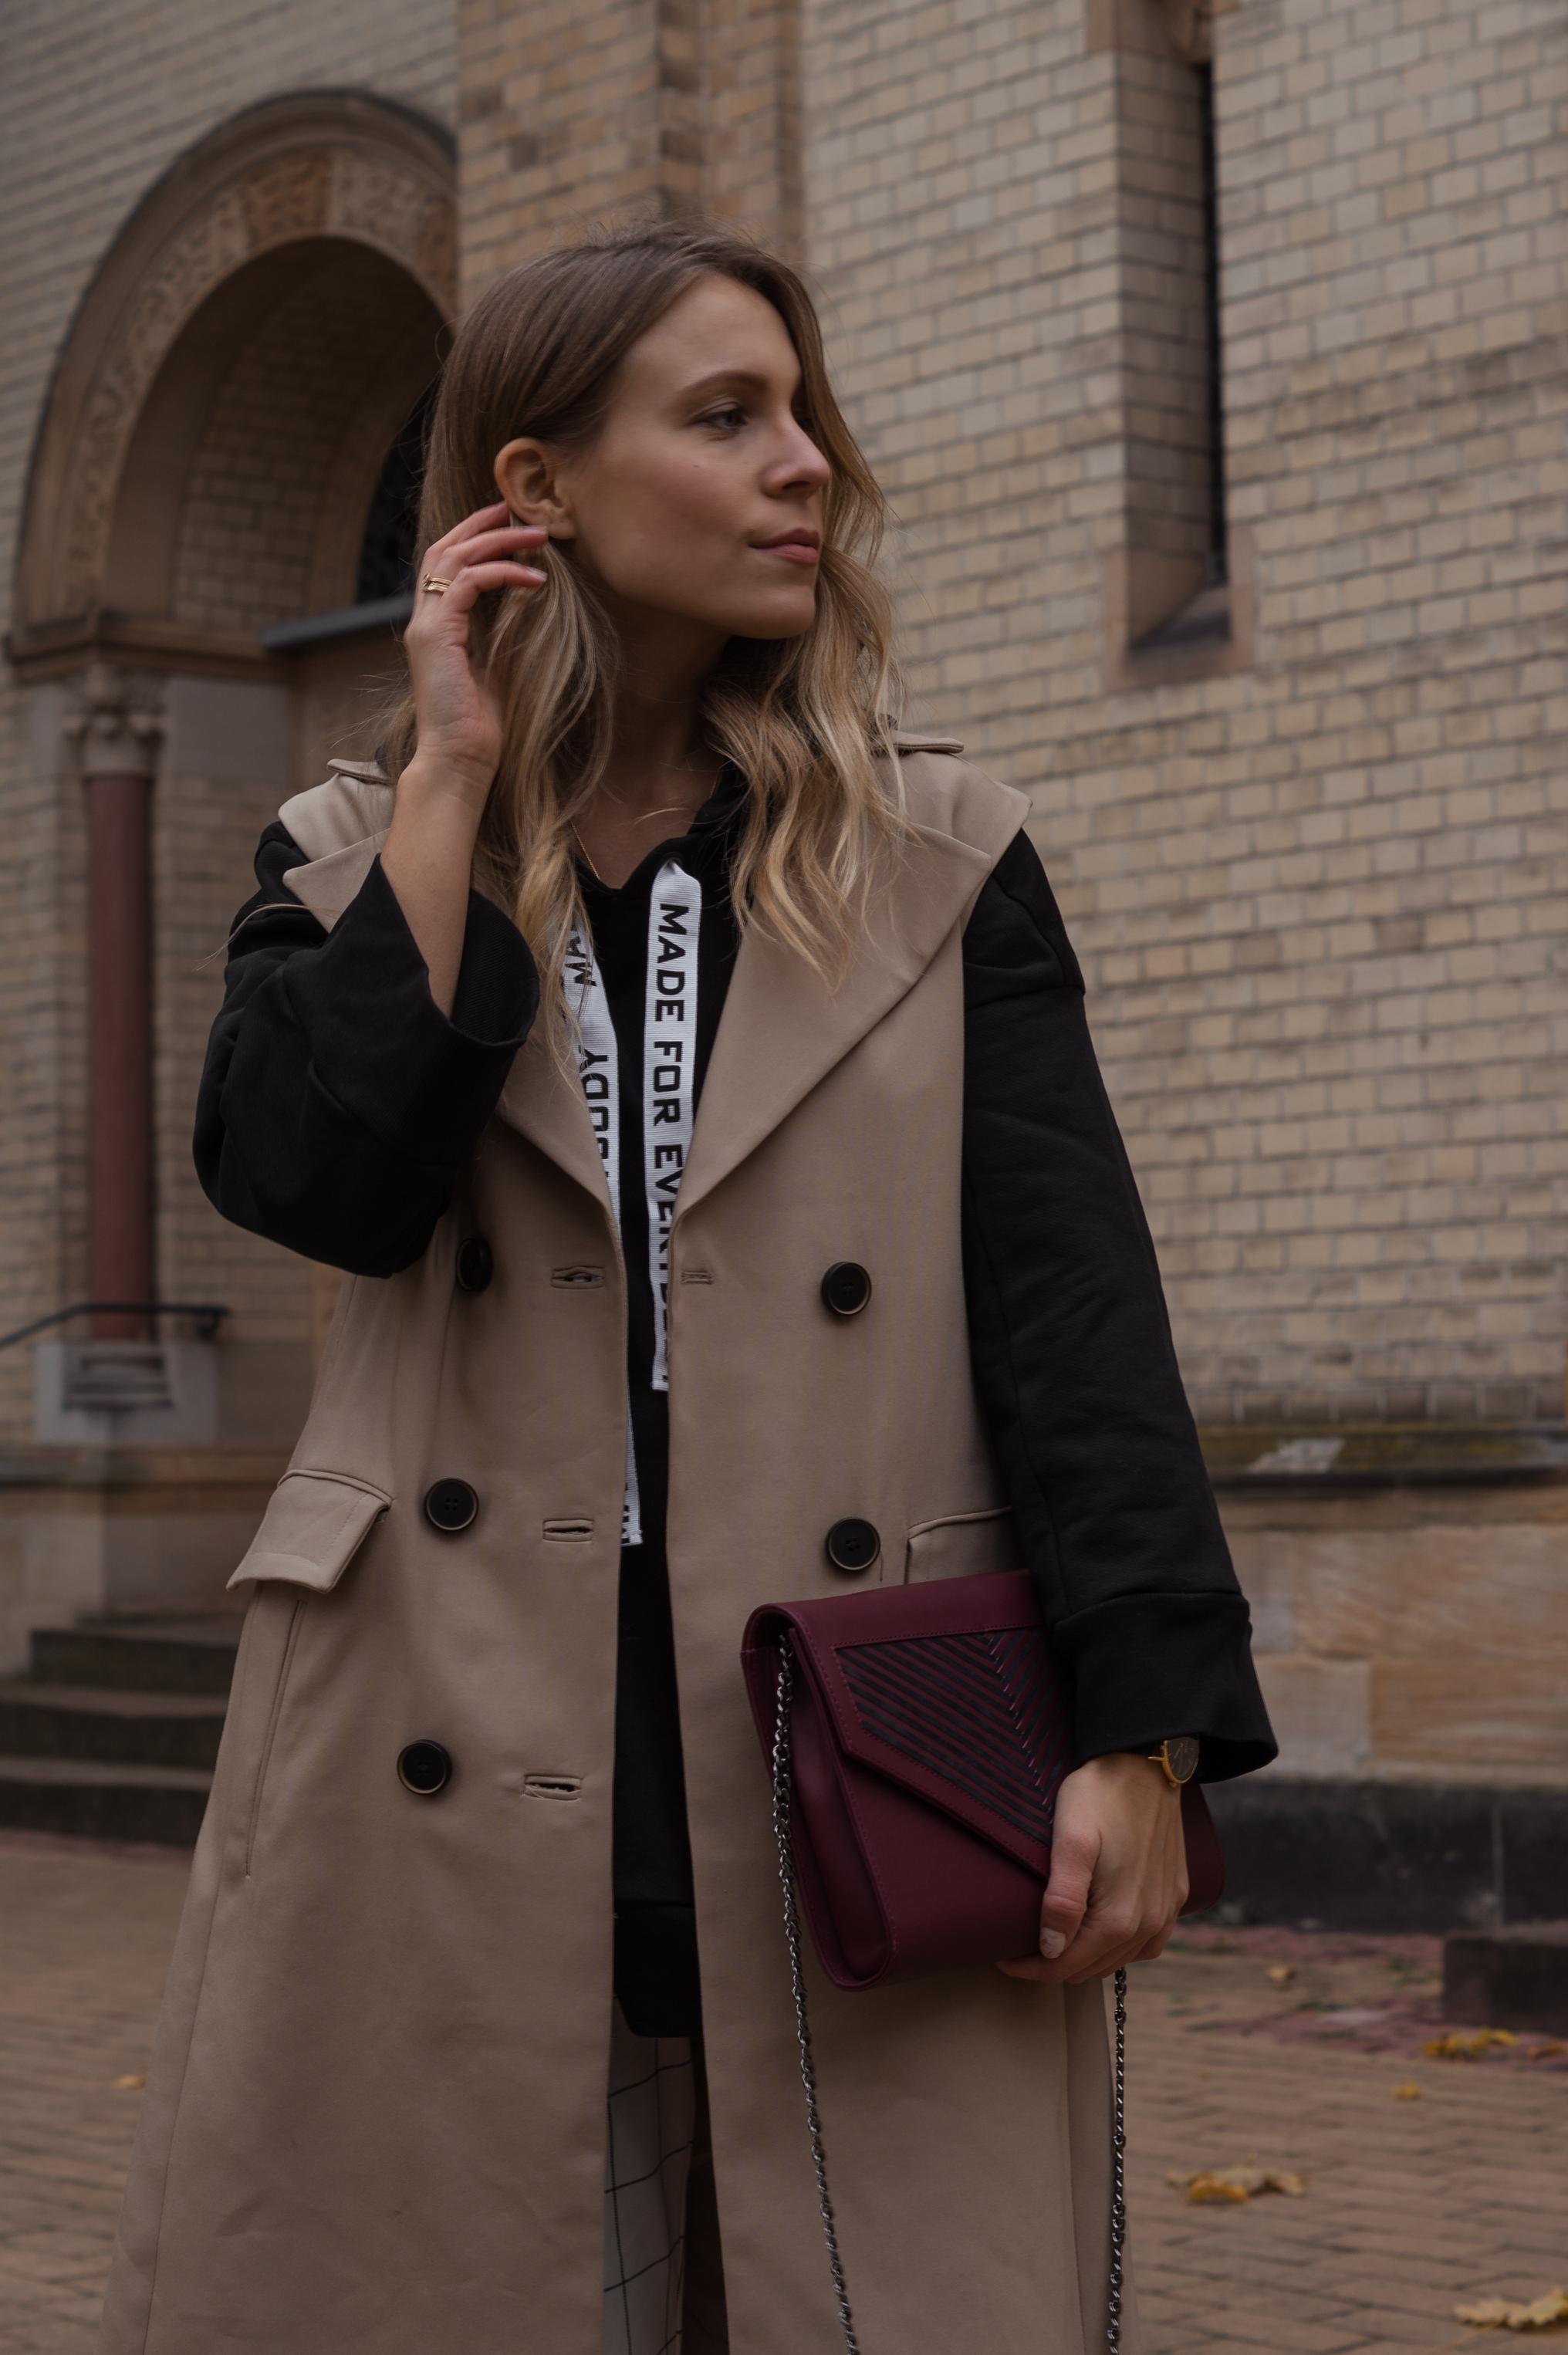 Zara Hoodie Trench Vest Lili Radu Bag Fashionblogger Sariety Modeblog Heidelberg Fall Layers karierte Hose Mango Streetstyle_3